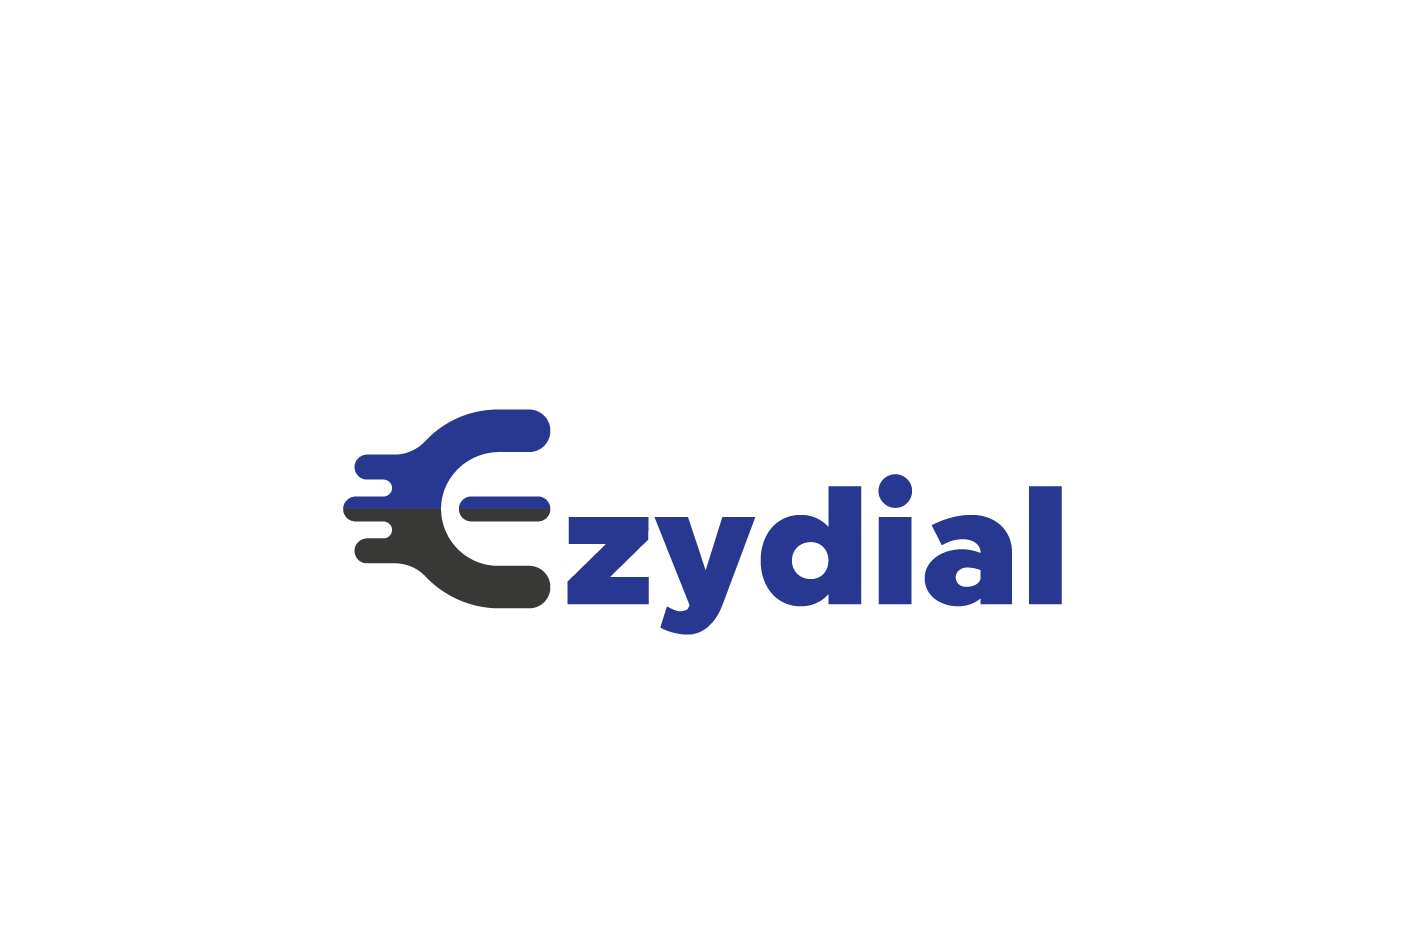 Ezydial